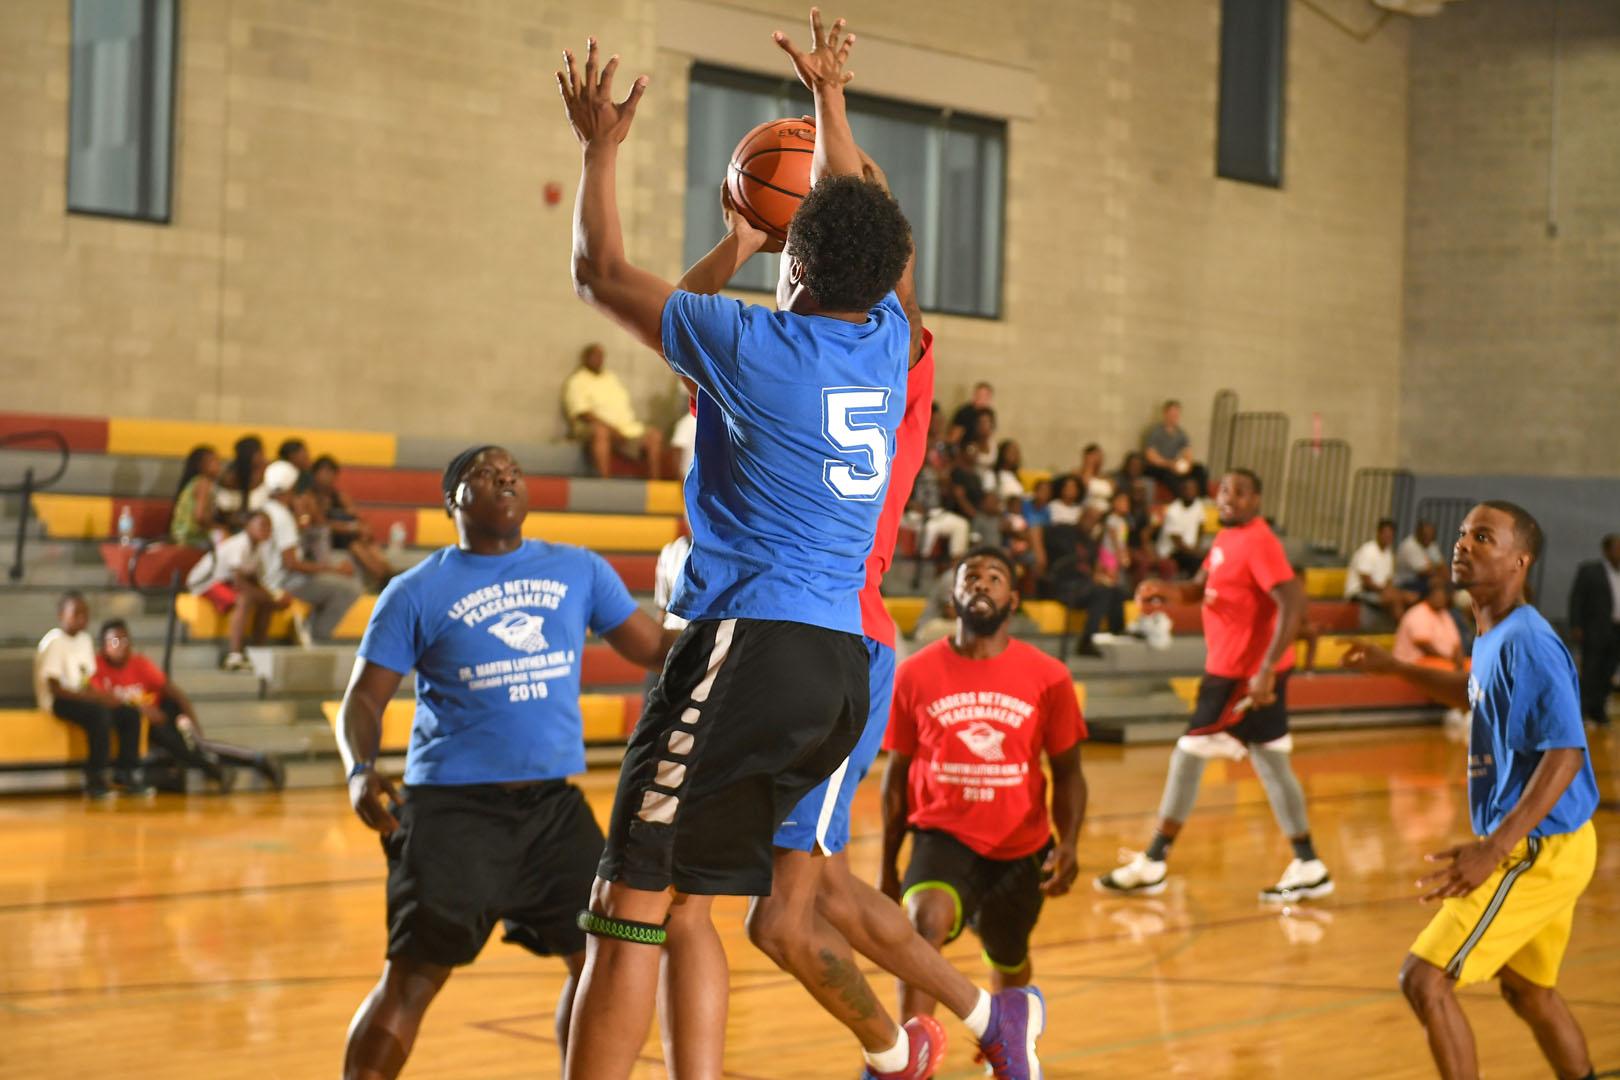 LNBasketball-30384.jpg